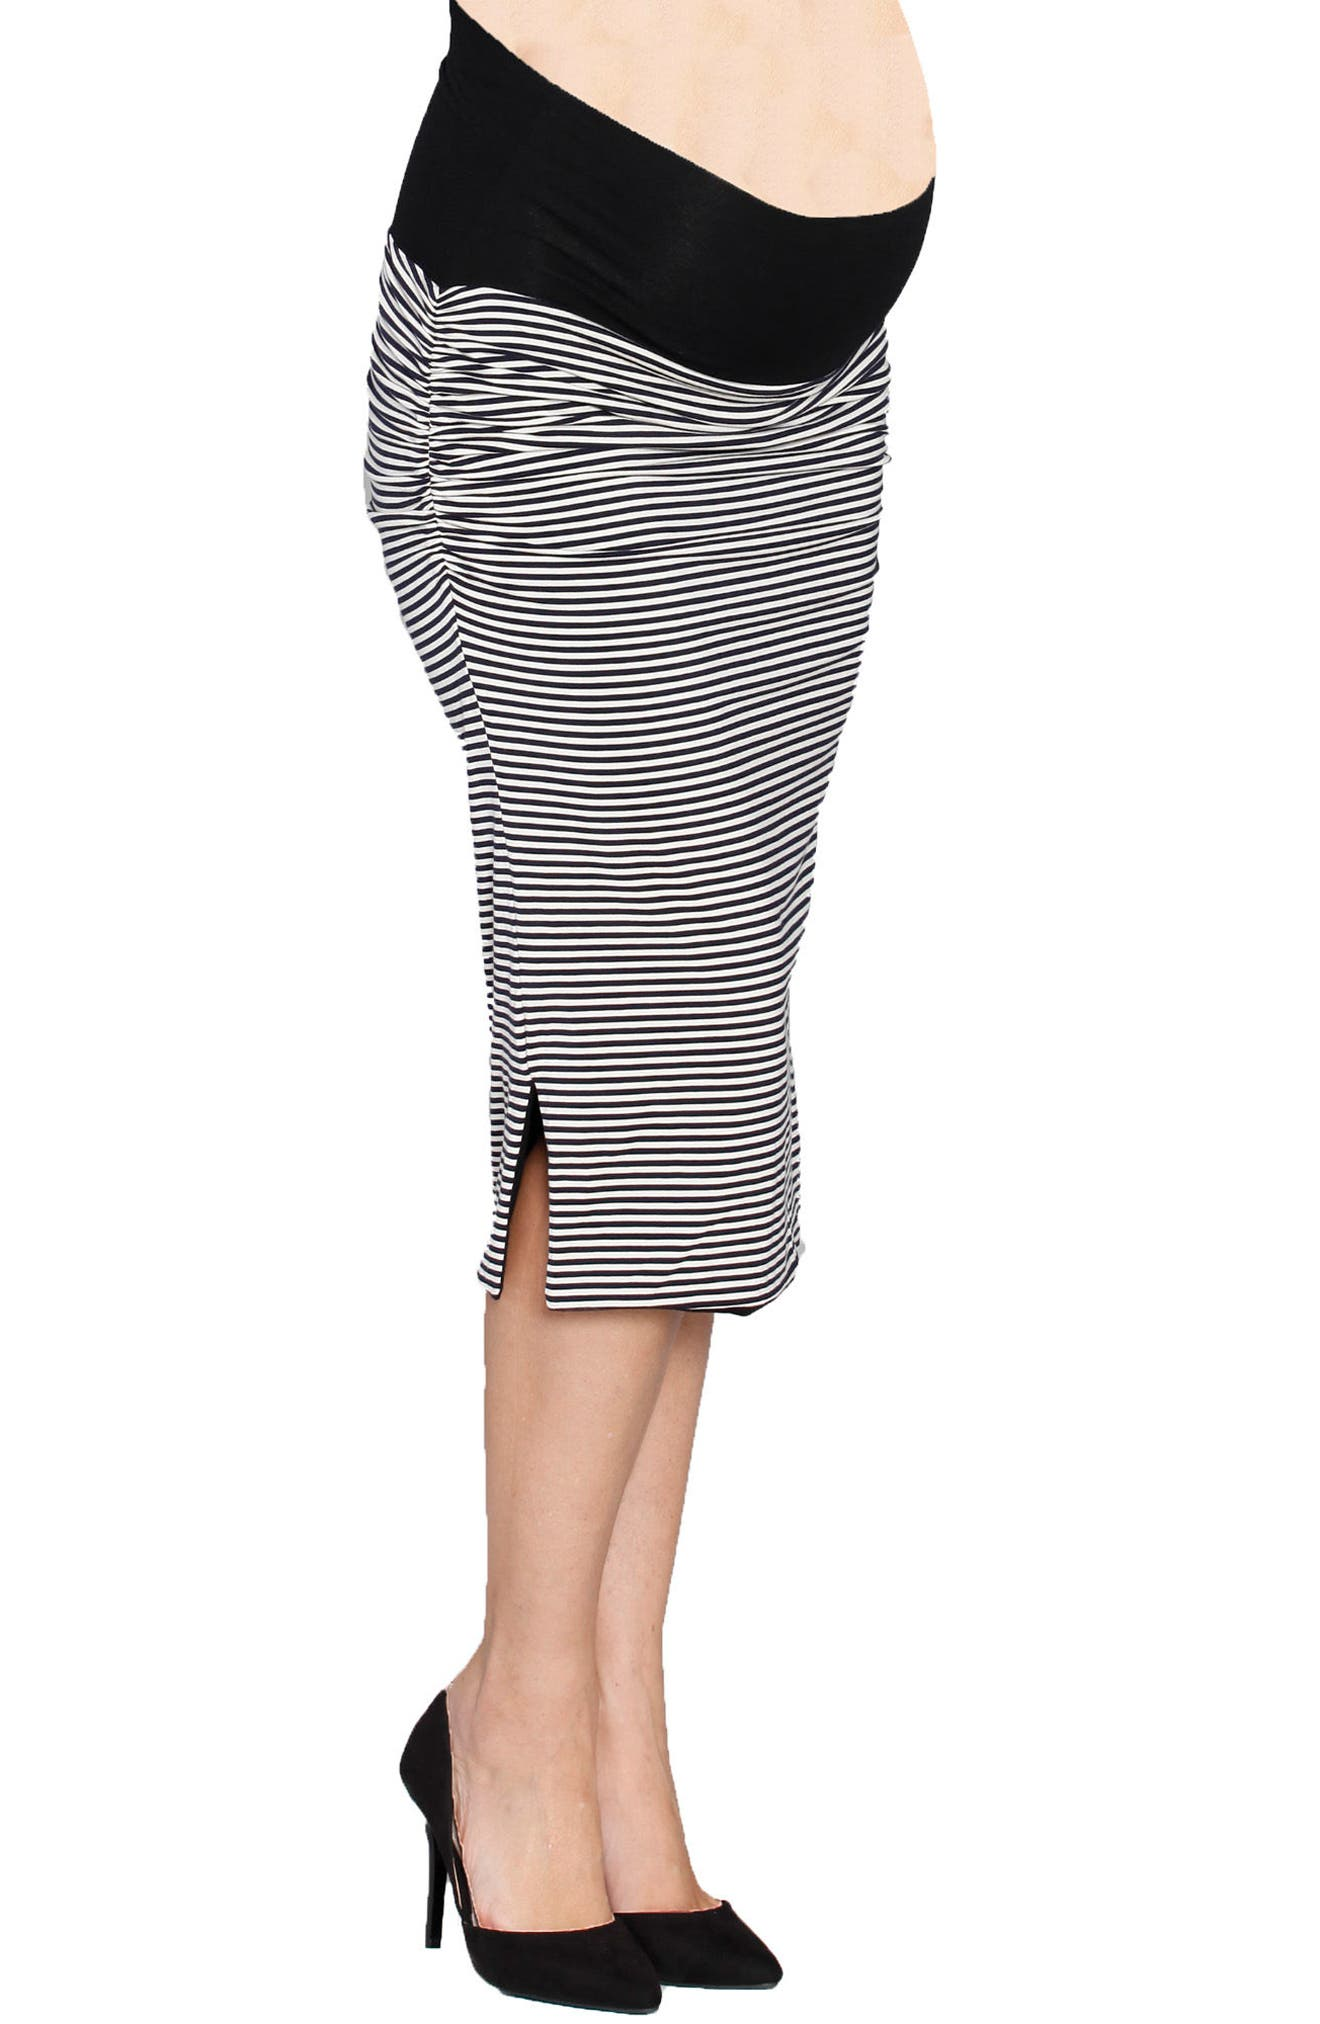 Reversible Maternity Skirt,                         Main,                         color, Stripes